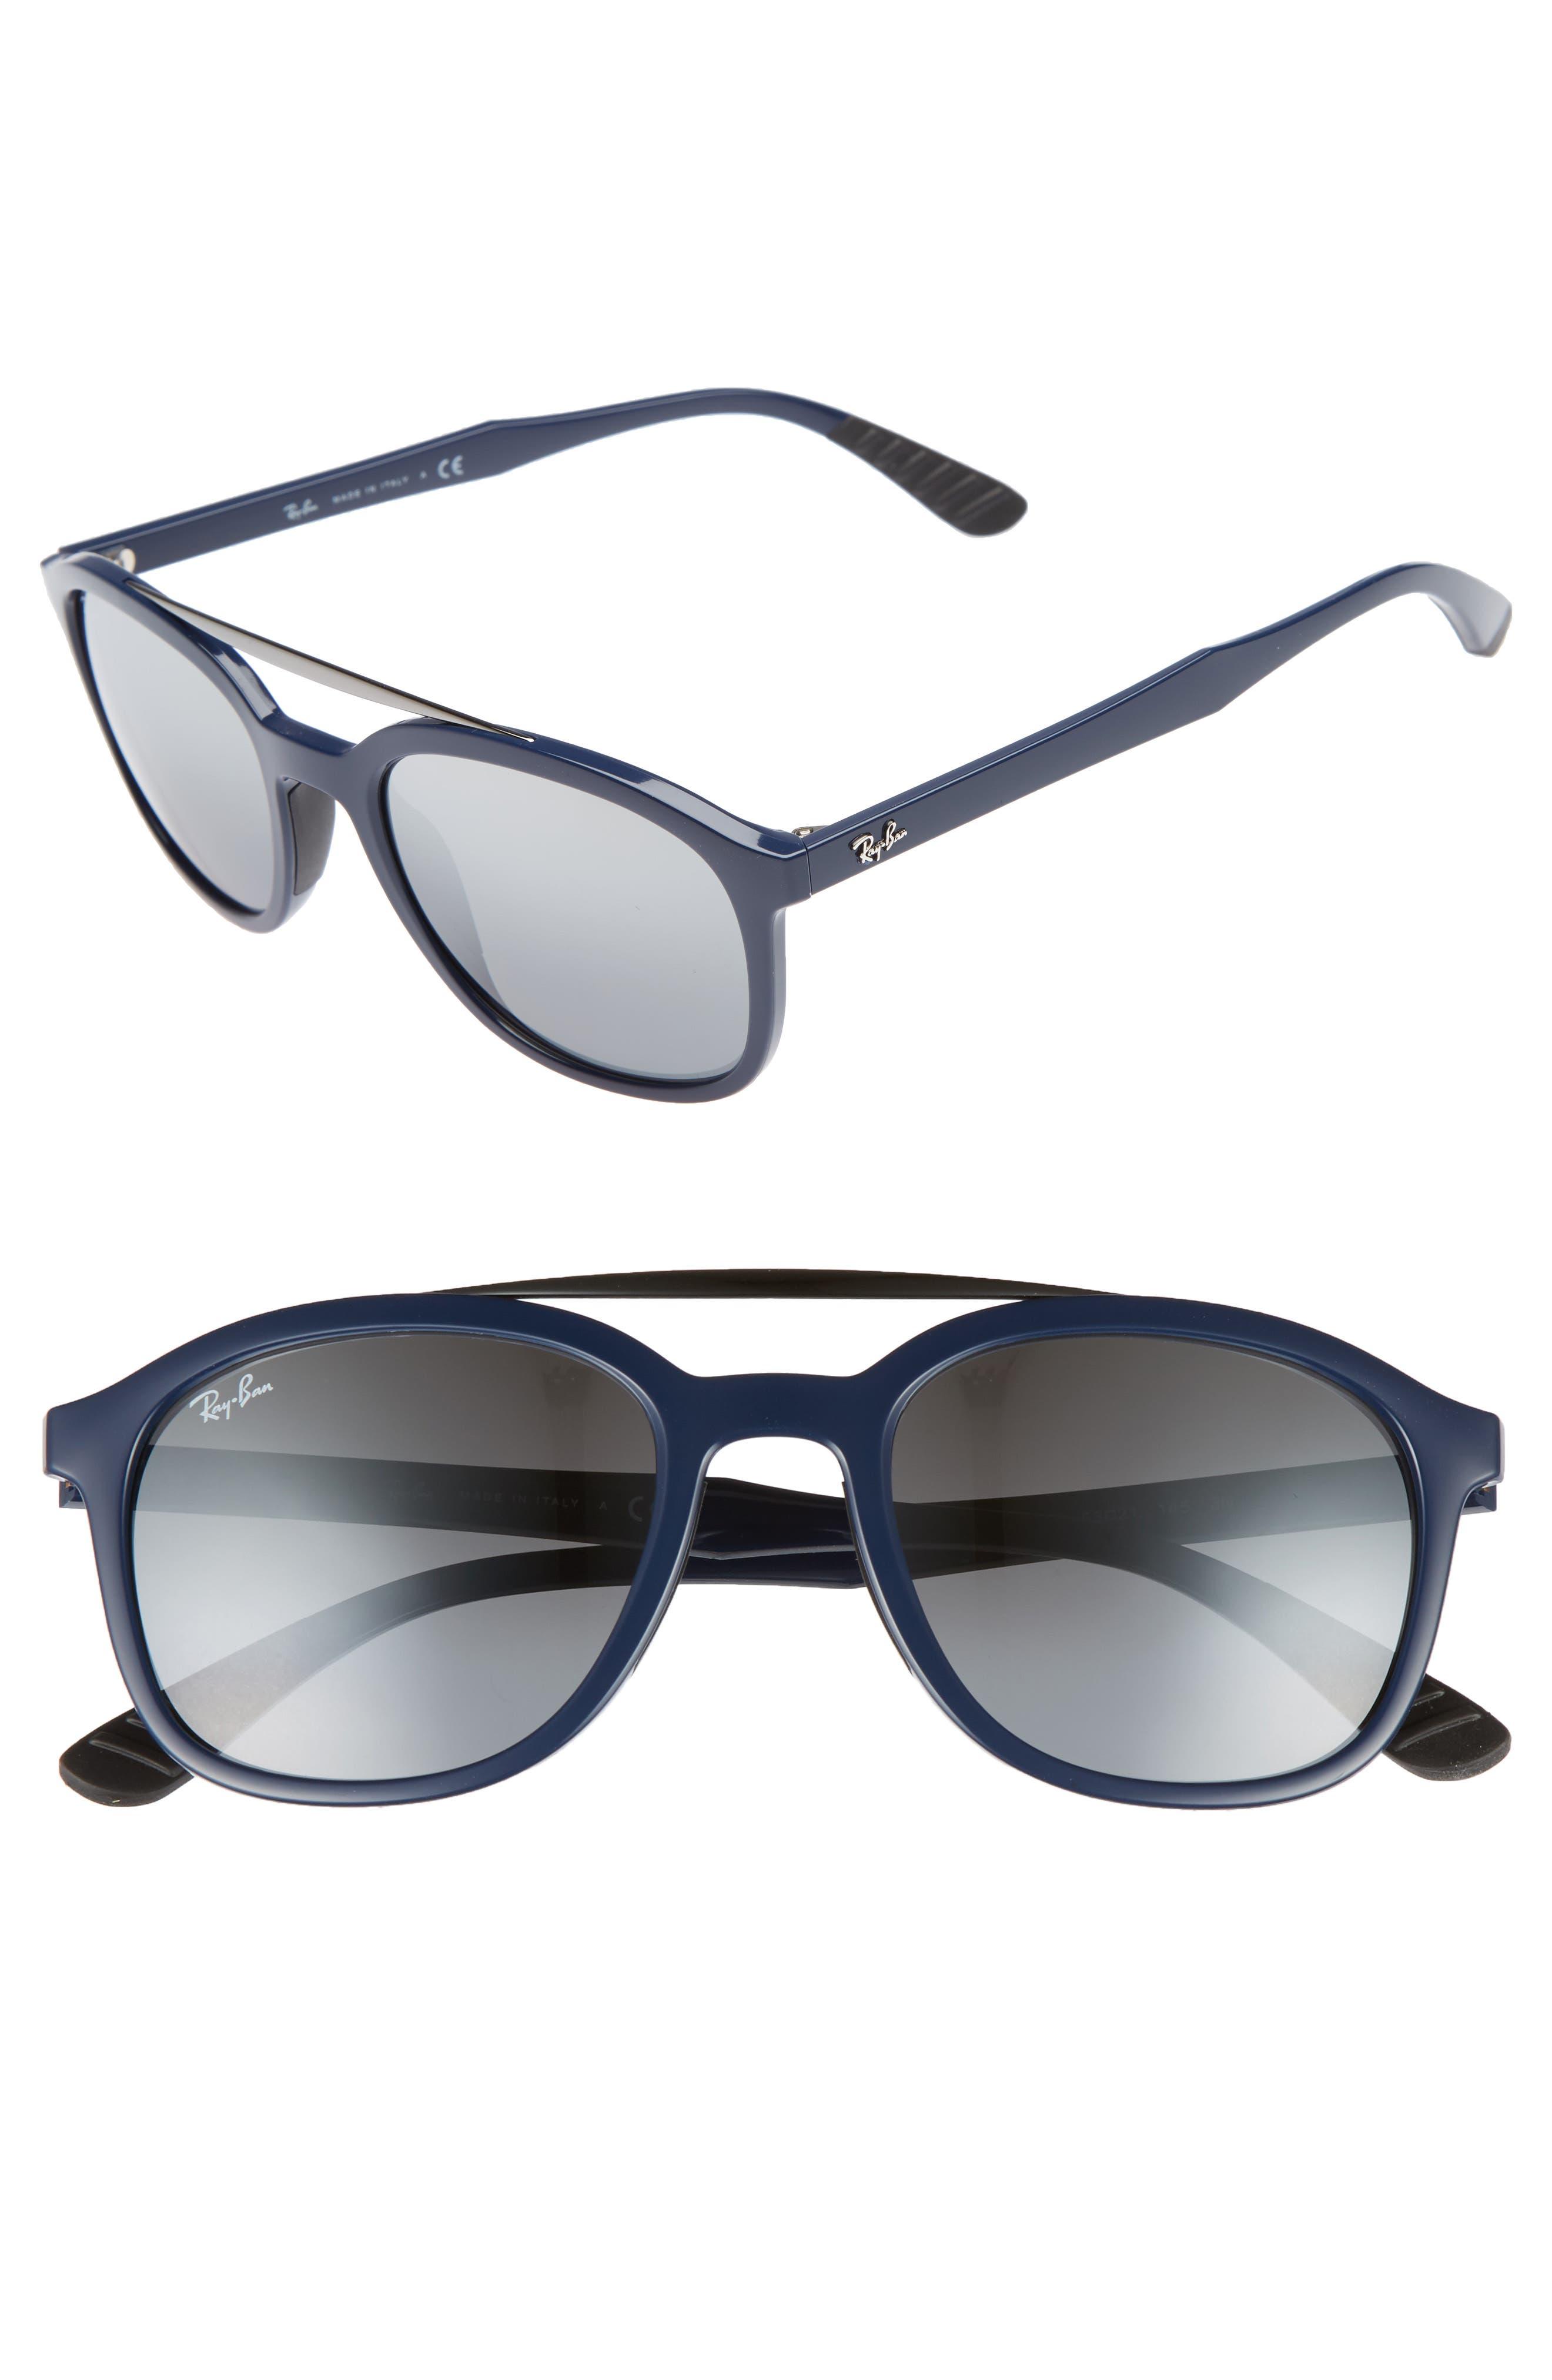 Active Lifestyle 53mm Sunglasses,                         Main,                         color, Blue